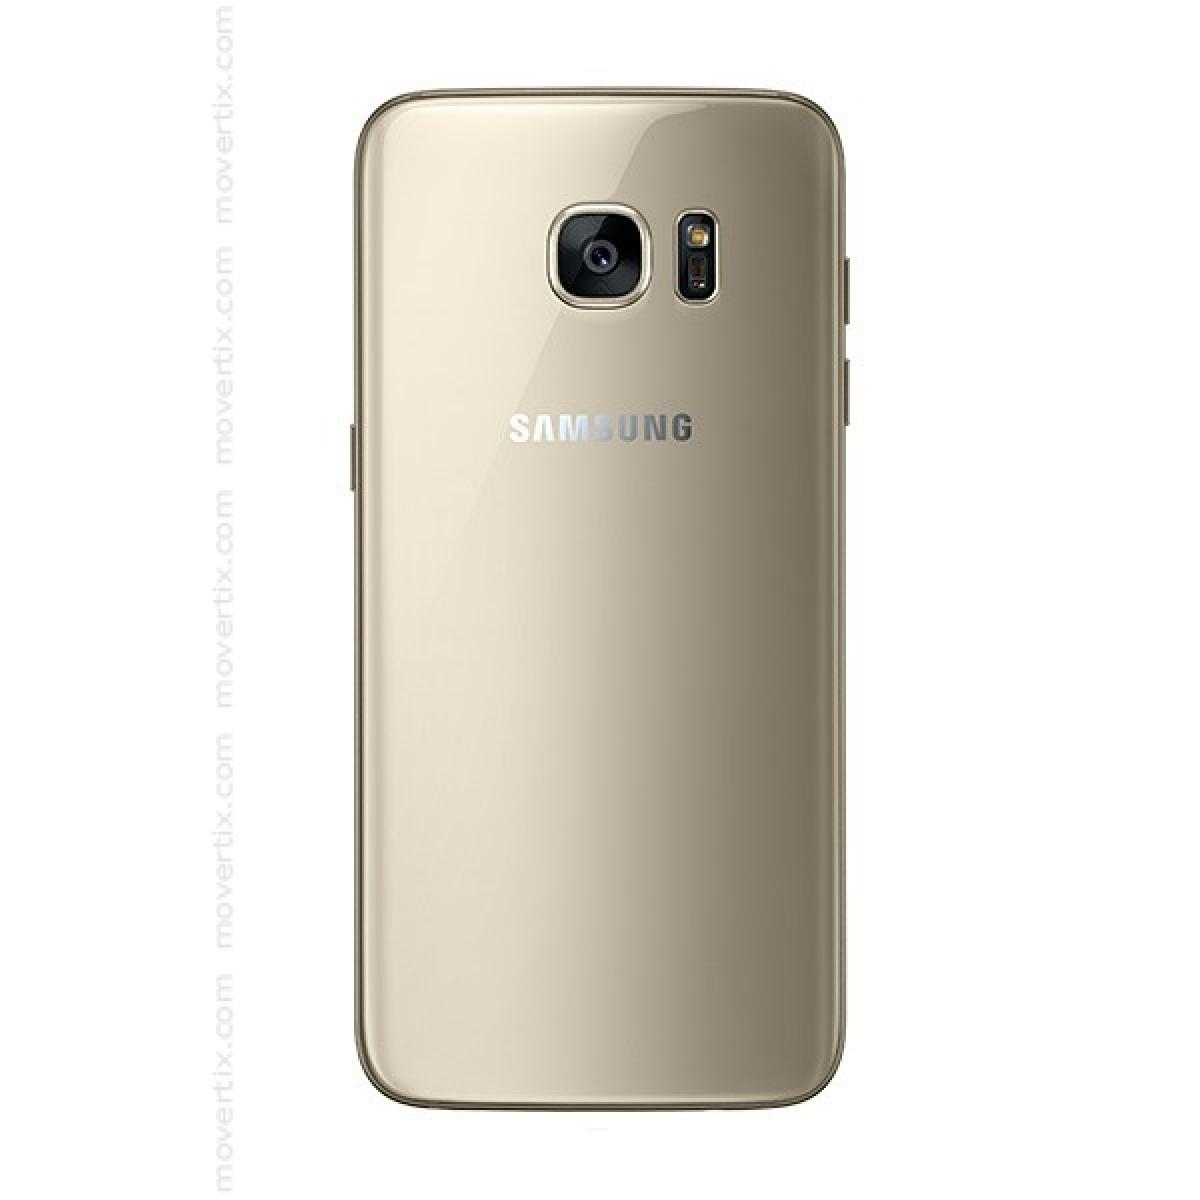 samsung galaxy s7 edge g935f dor avec 32go 8806088180274 movertix t l phones mobiles et. Black Bedroom Furniture Sets. Home Design Ideas